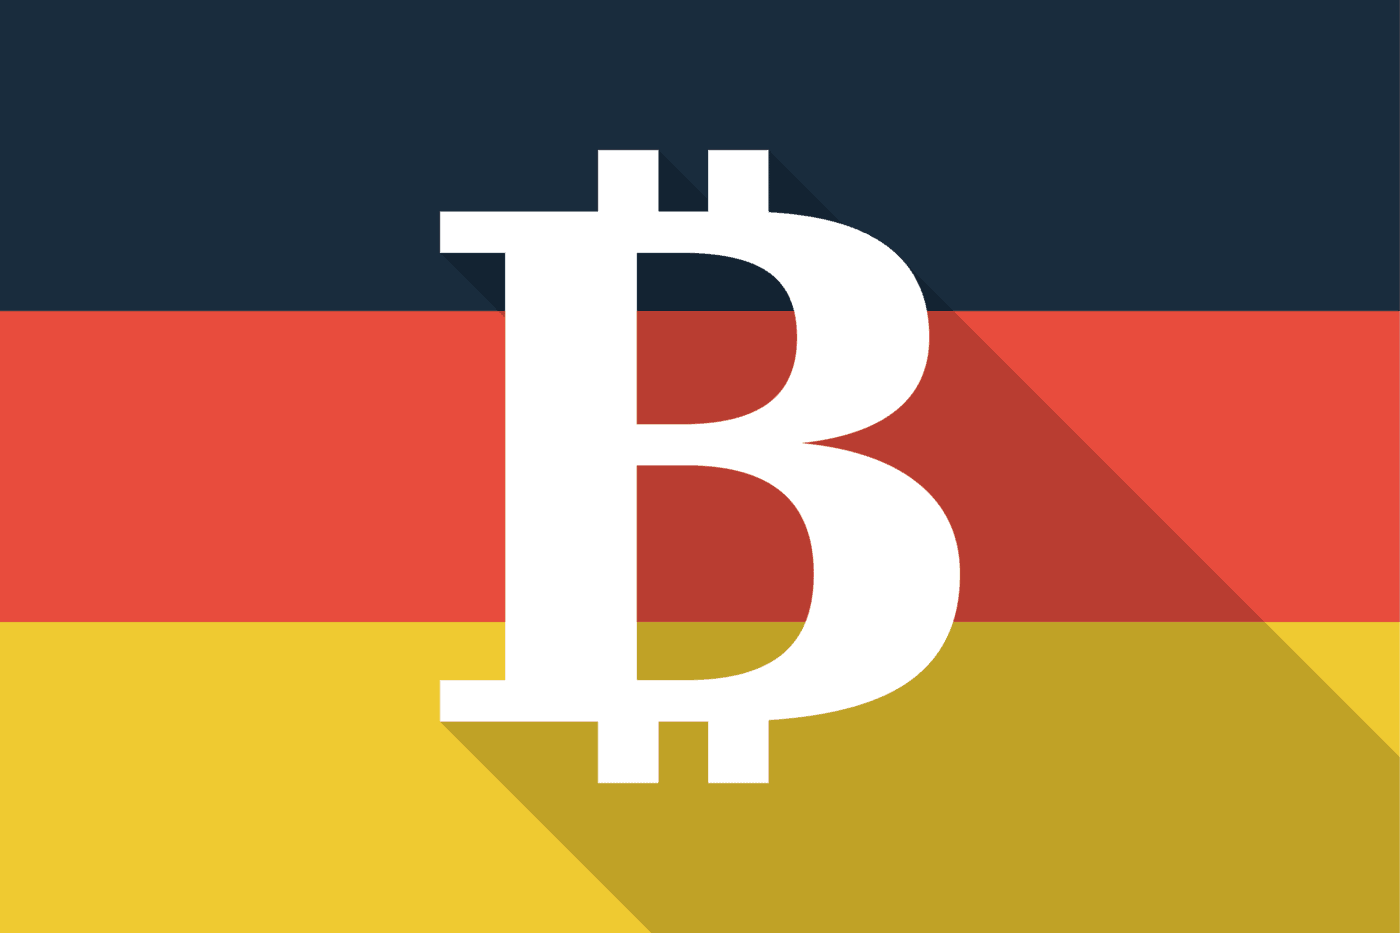 germania bitcoin trading)